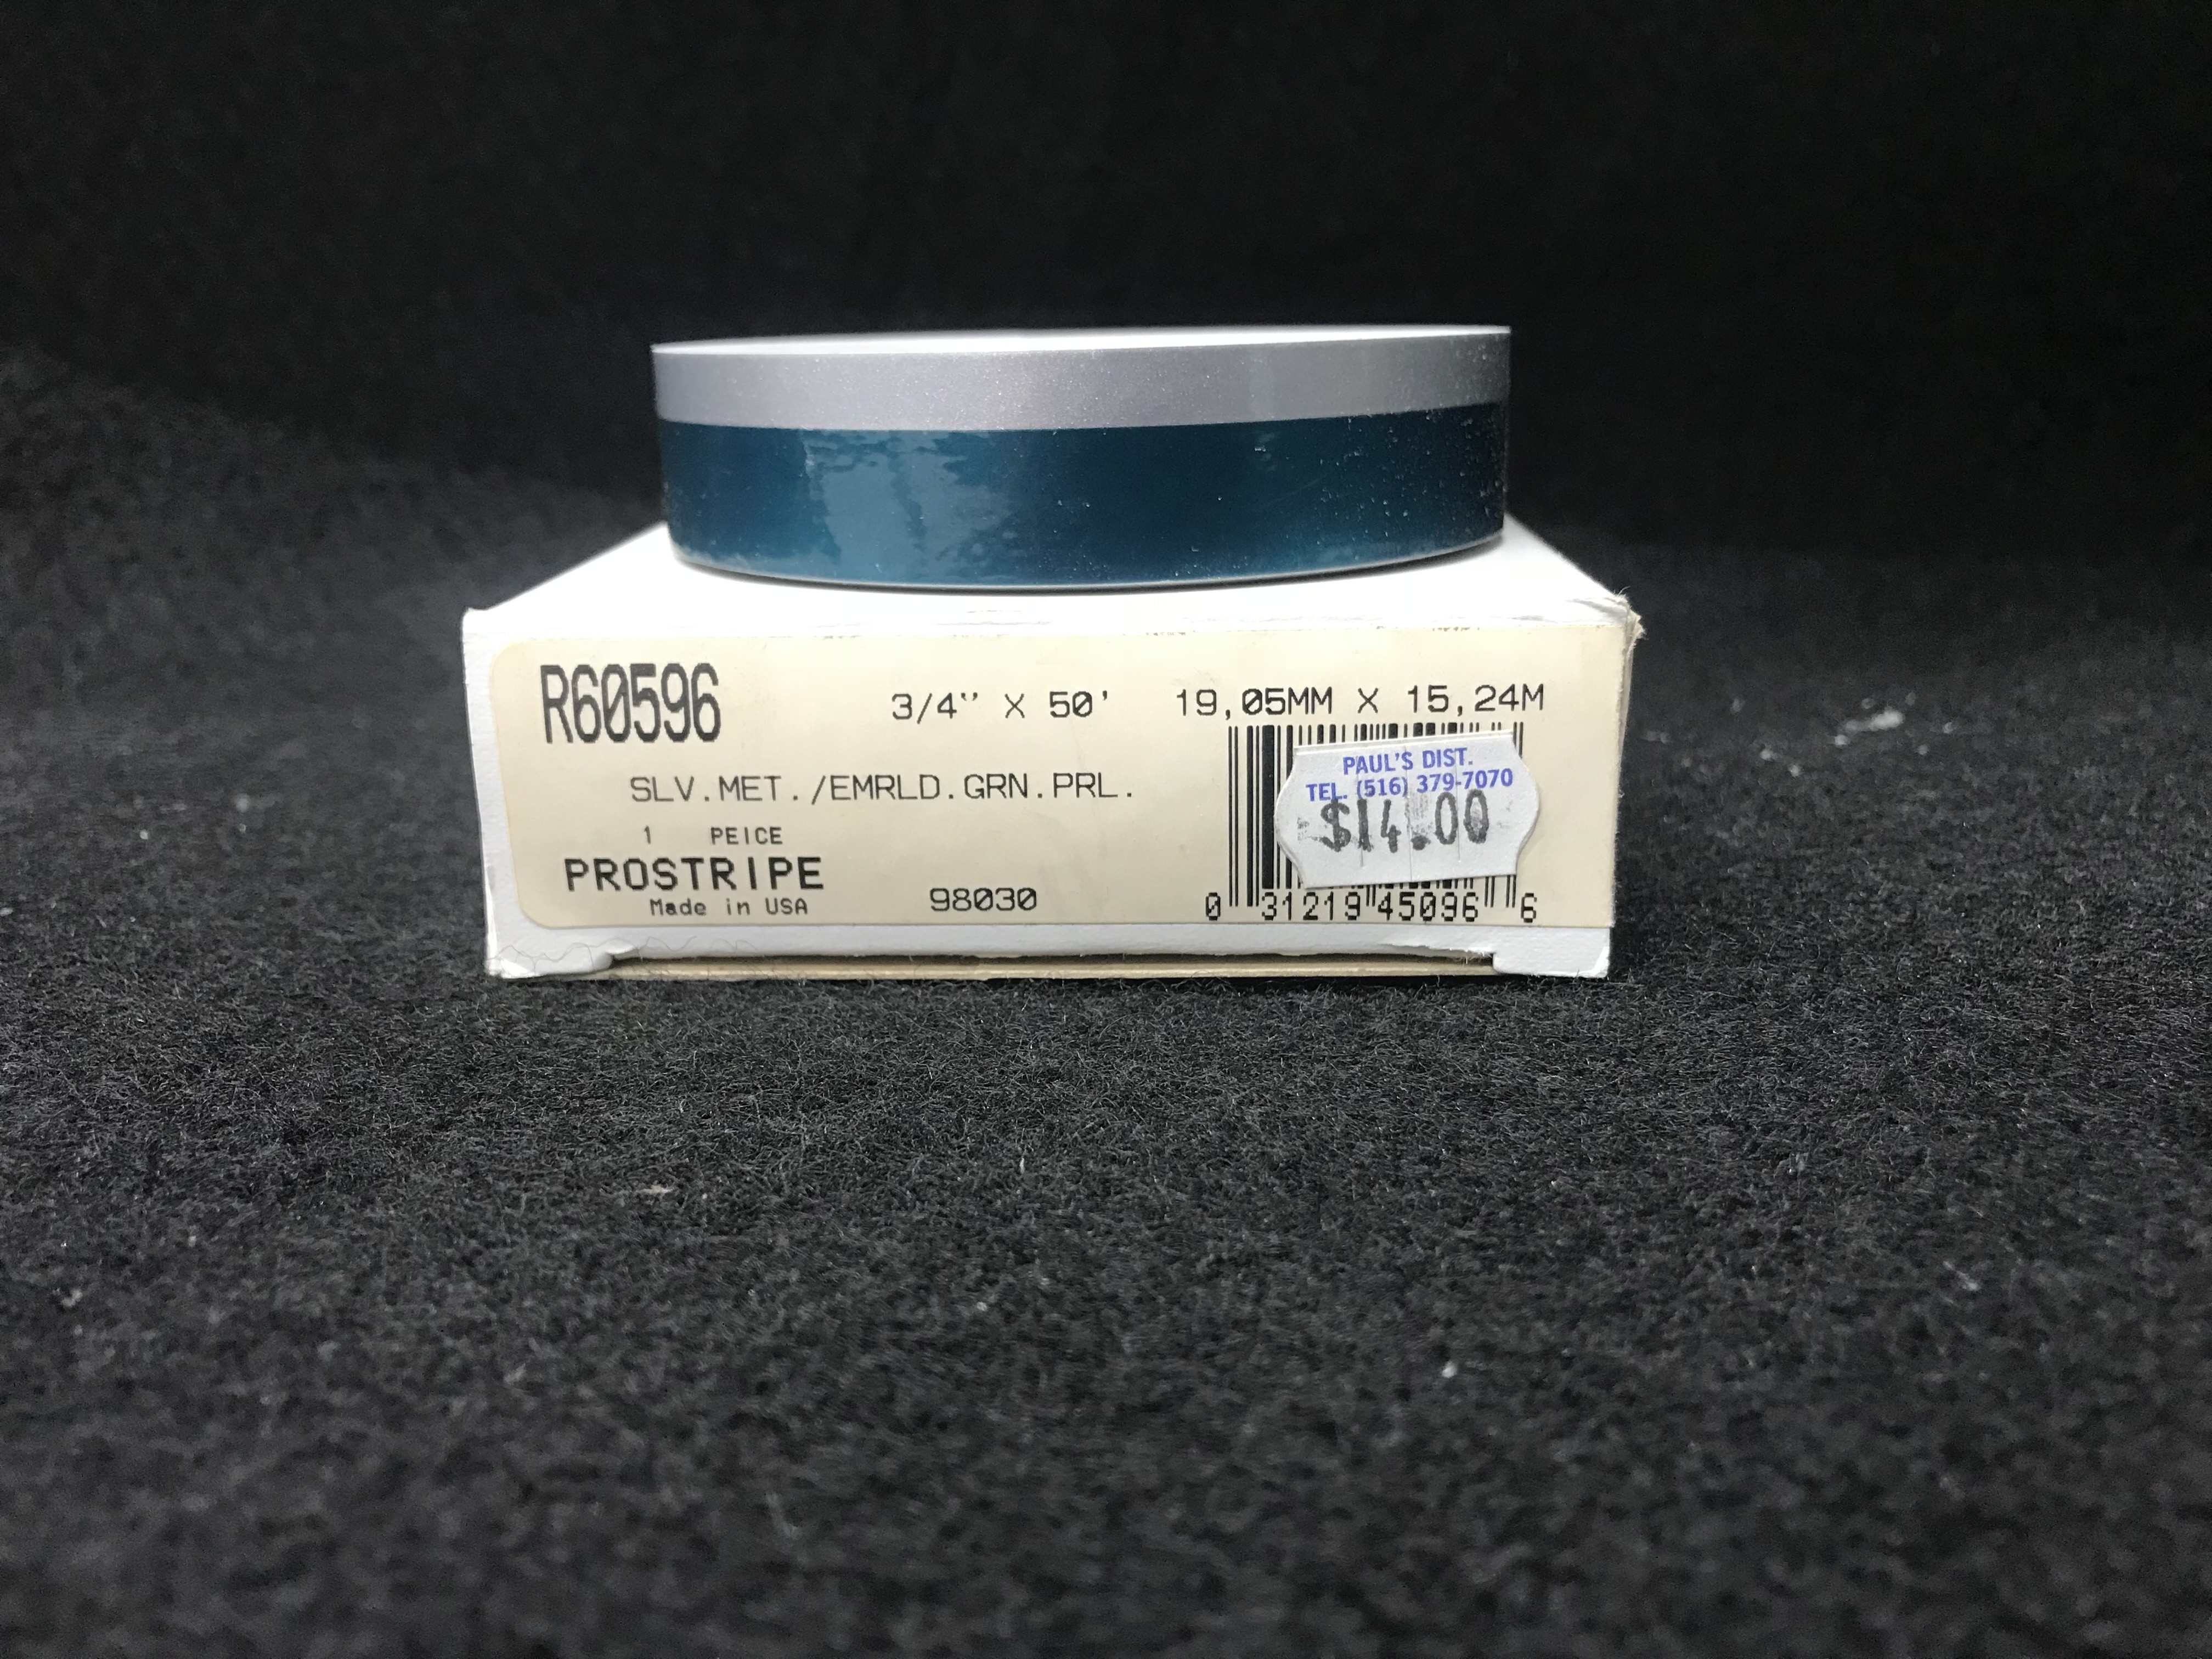 "ProStripe R60596 Silver Metallic/Emerald Green Pearl Multi Stripe 3/4"" x 50'"